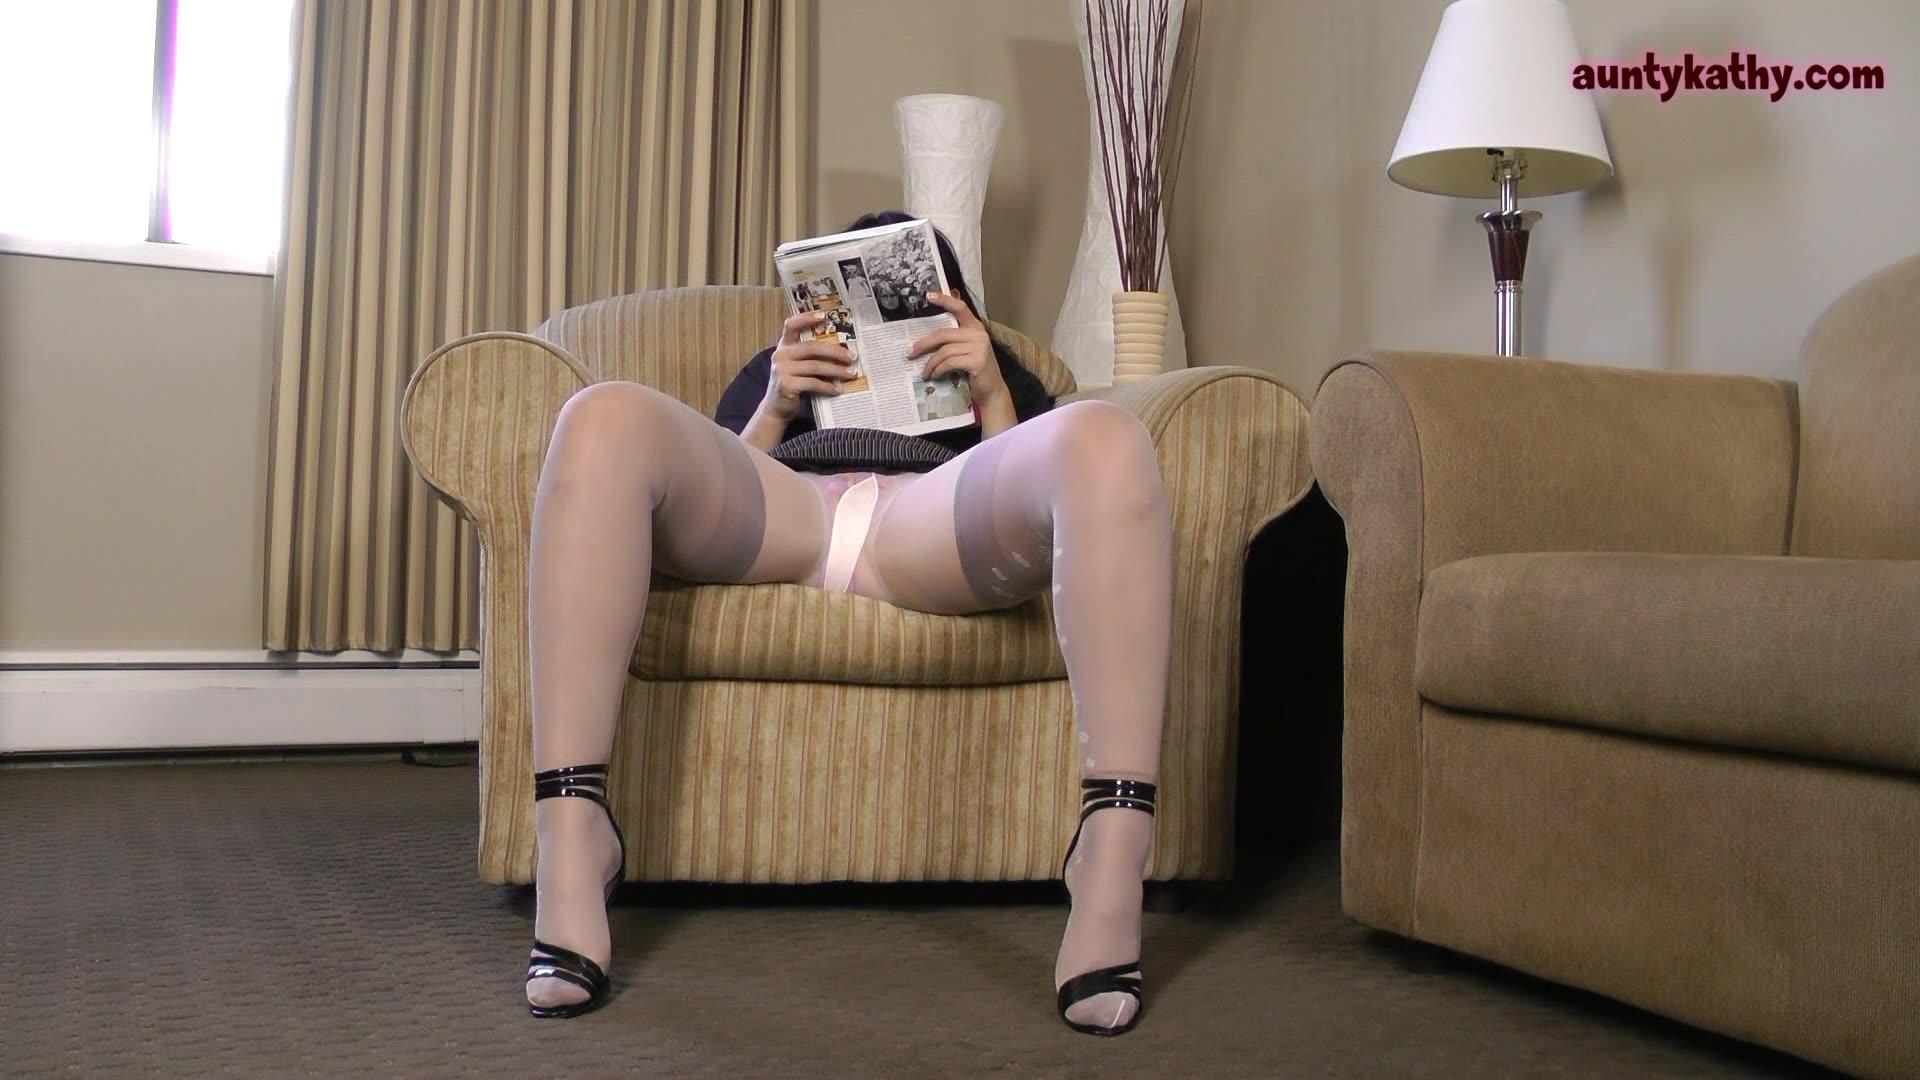 News Pantyhose Tops Pantyhose 26